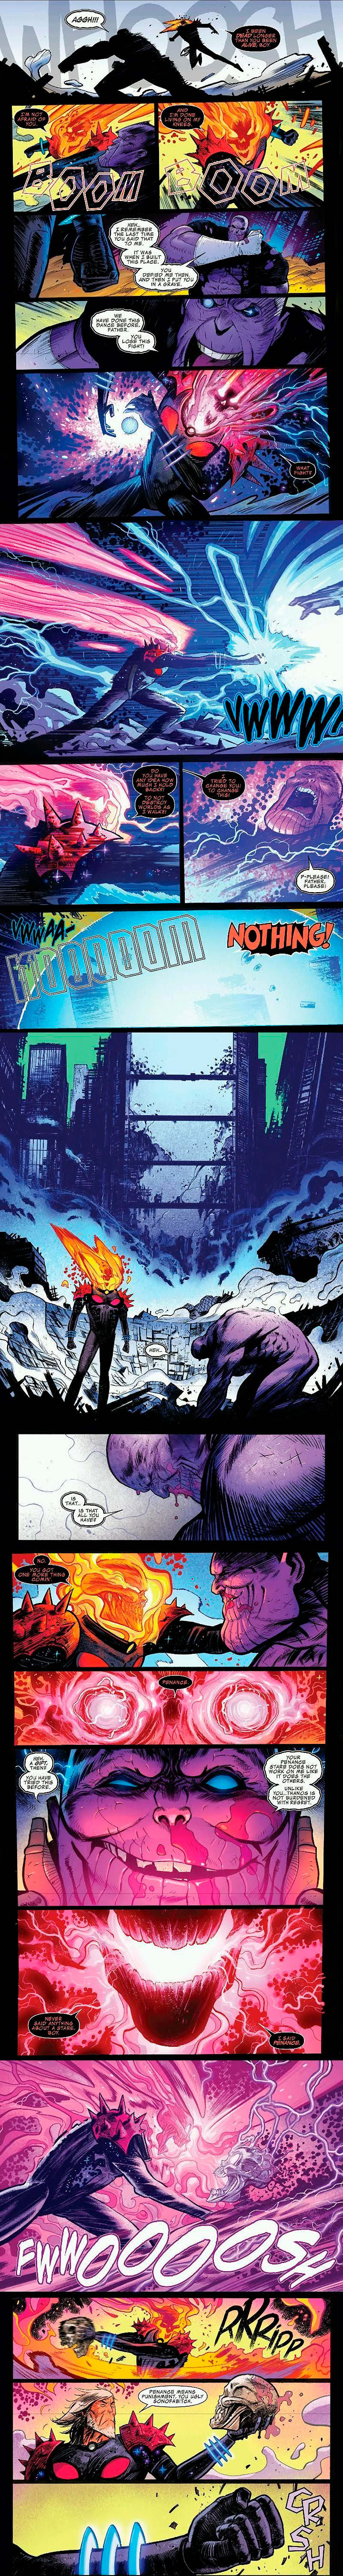 Ghost Rider kills Punisher Thanos